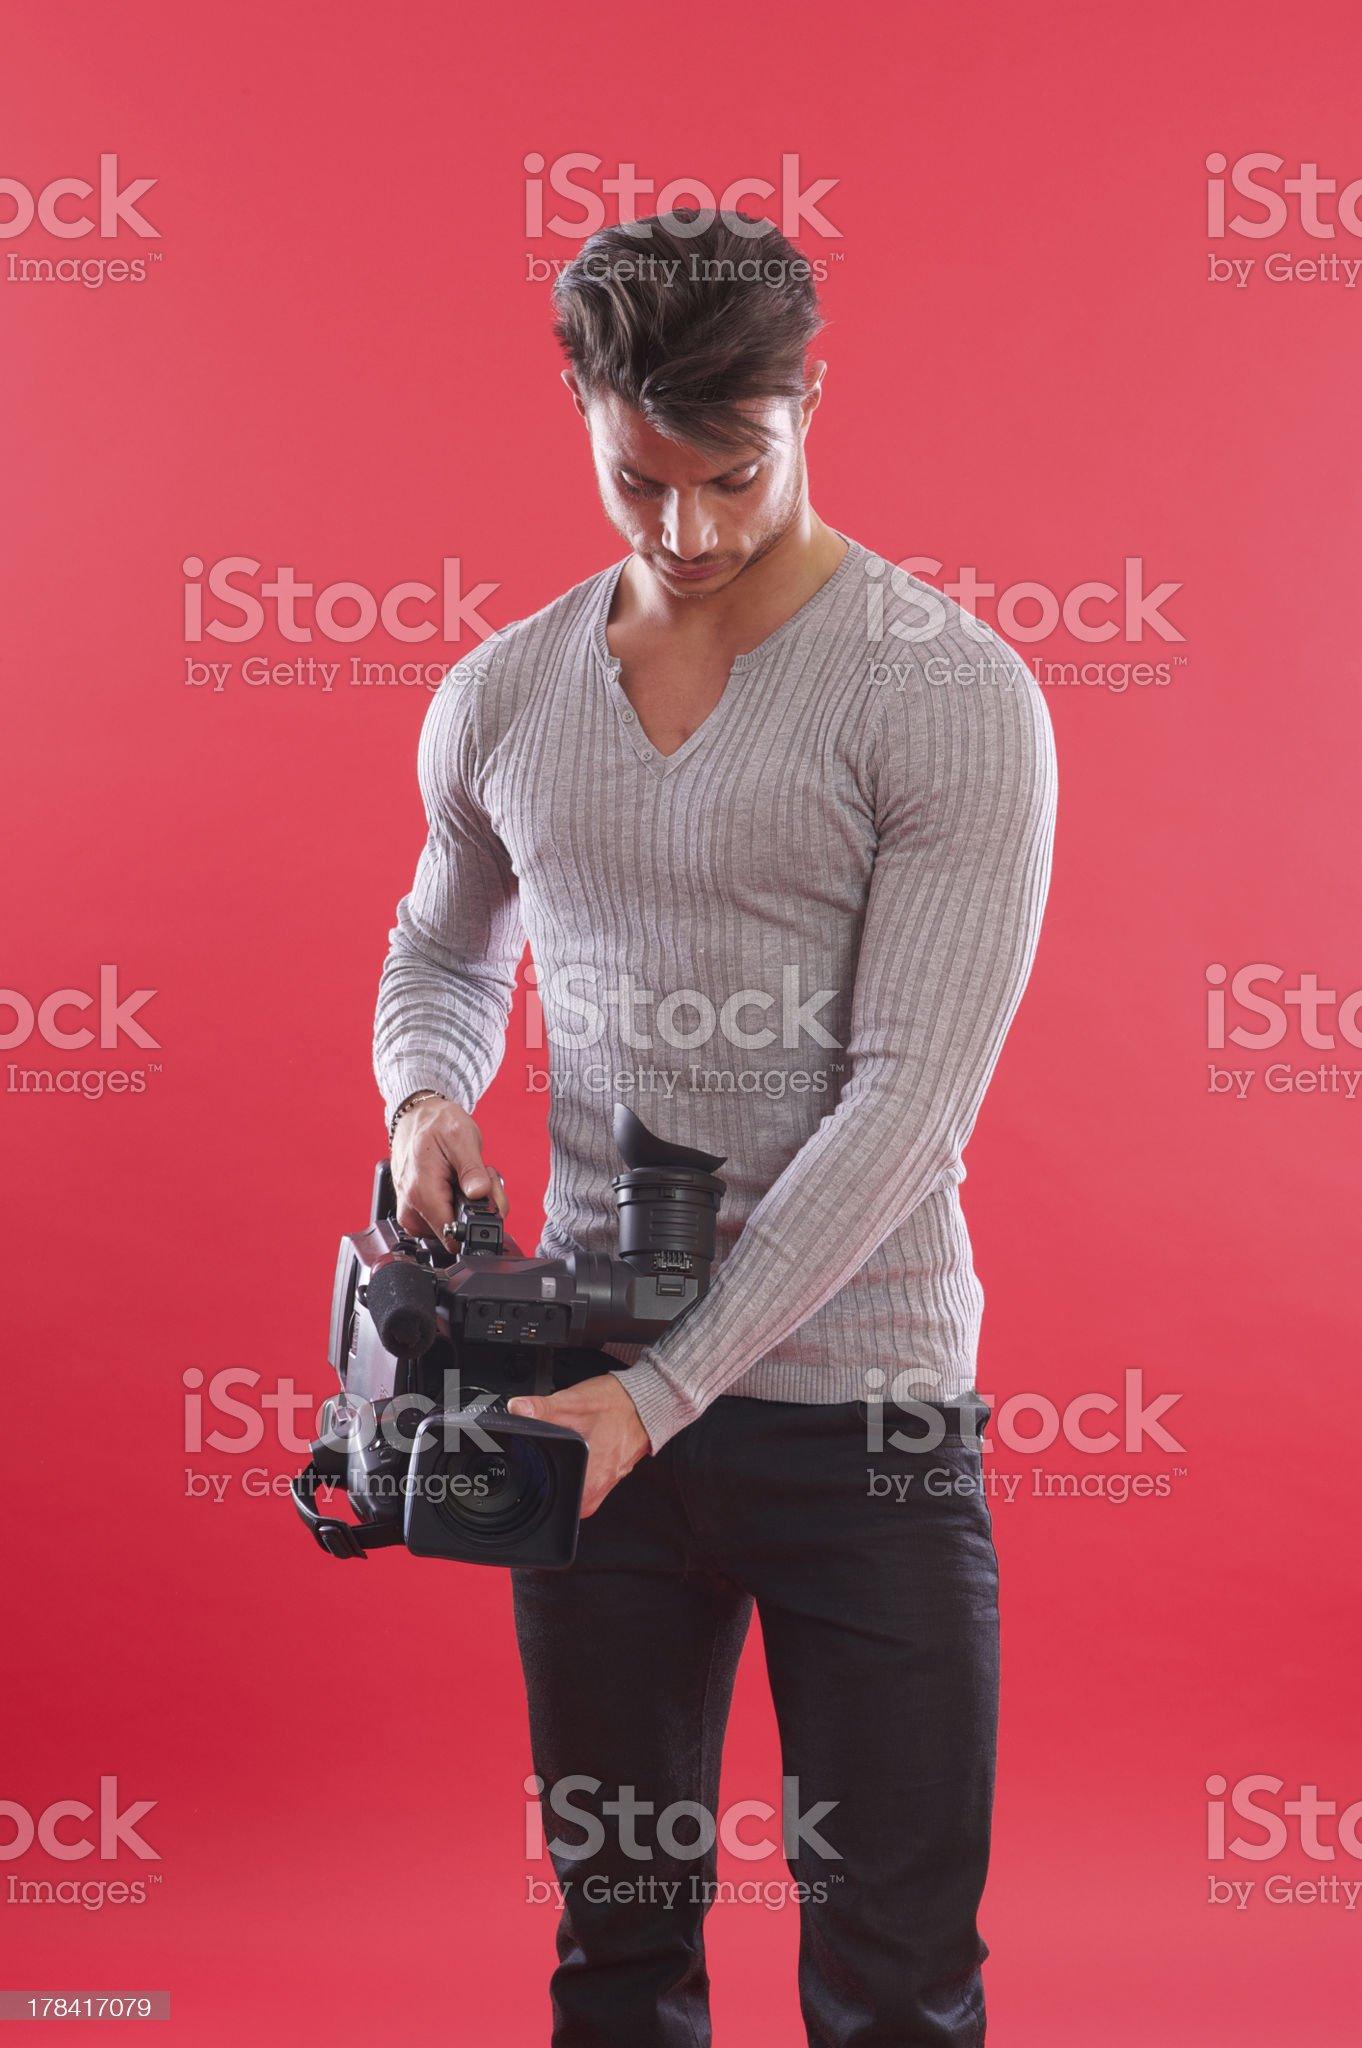 cameraman royalty-free stock photo